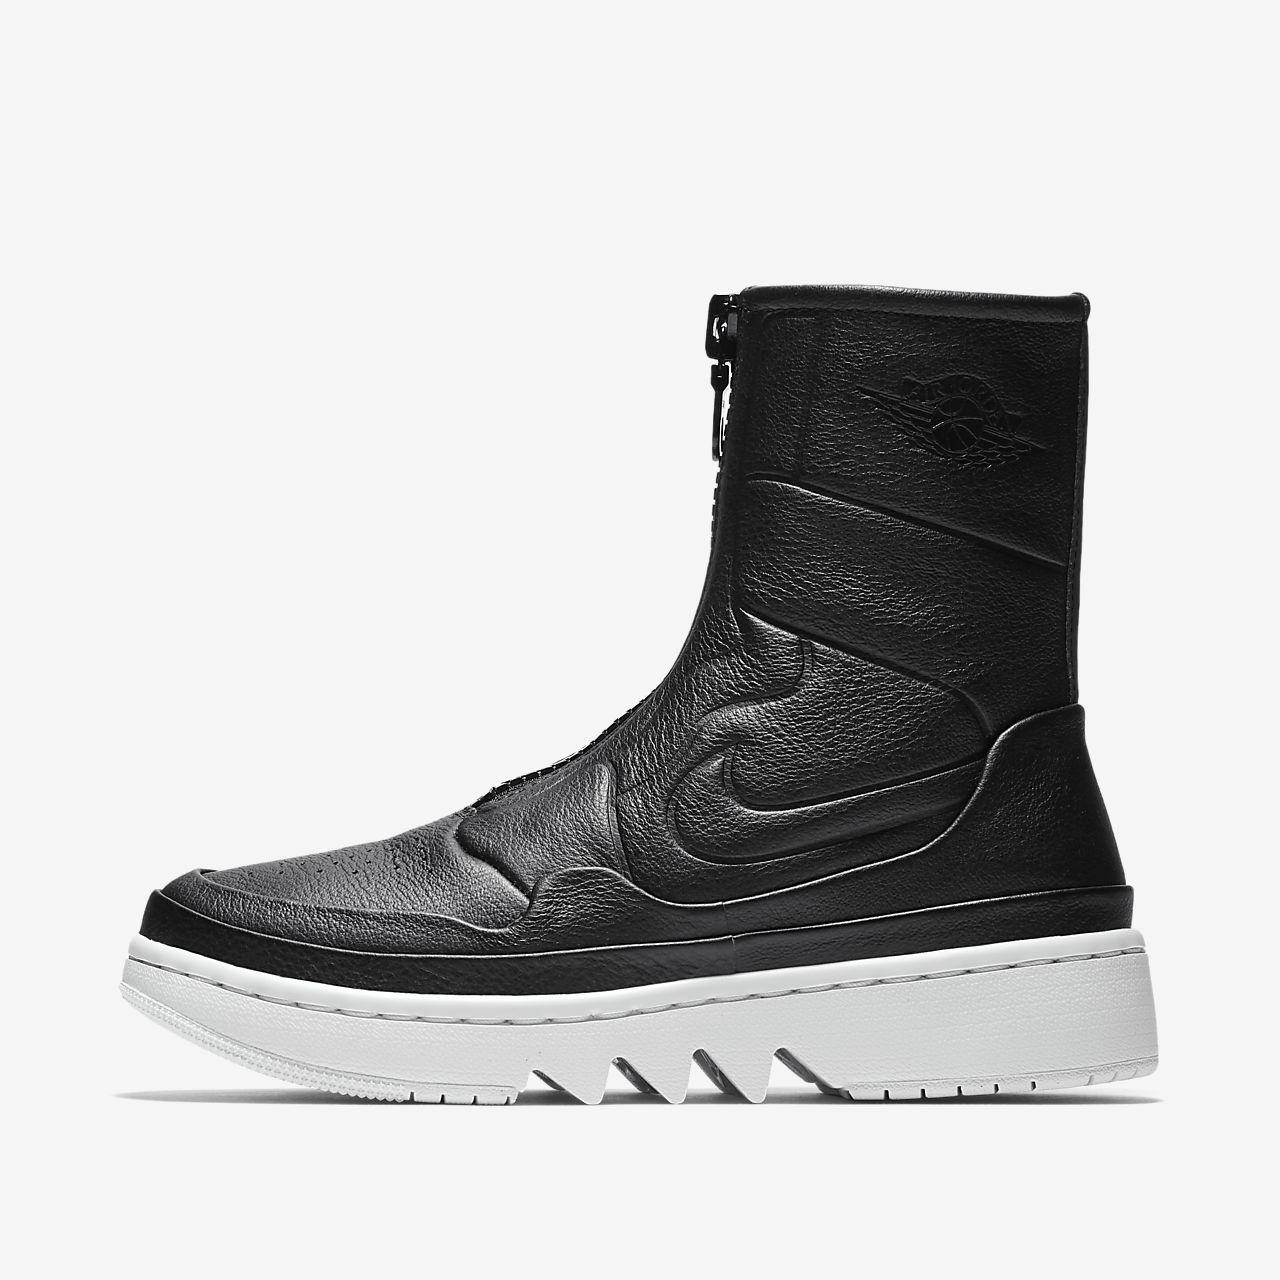 Sapatilhas Air Jordan 1 Jester XX para mulher